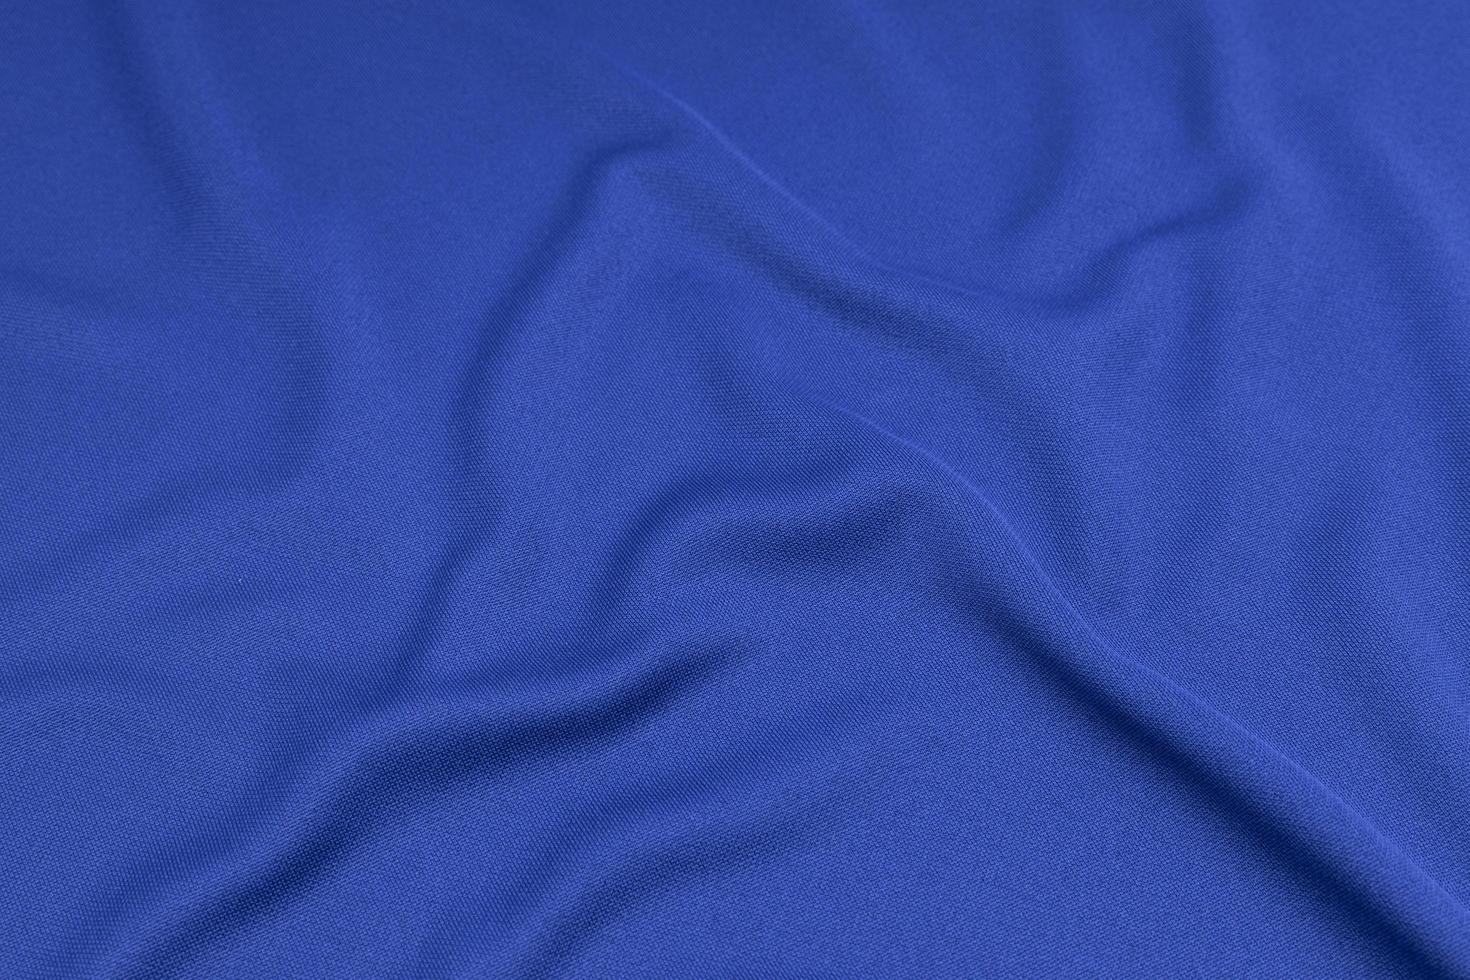 fond de texture de tissu de vêtements de sport photo